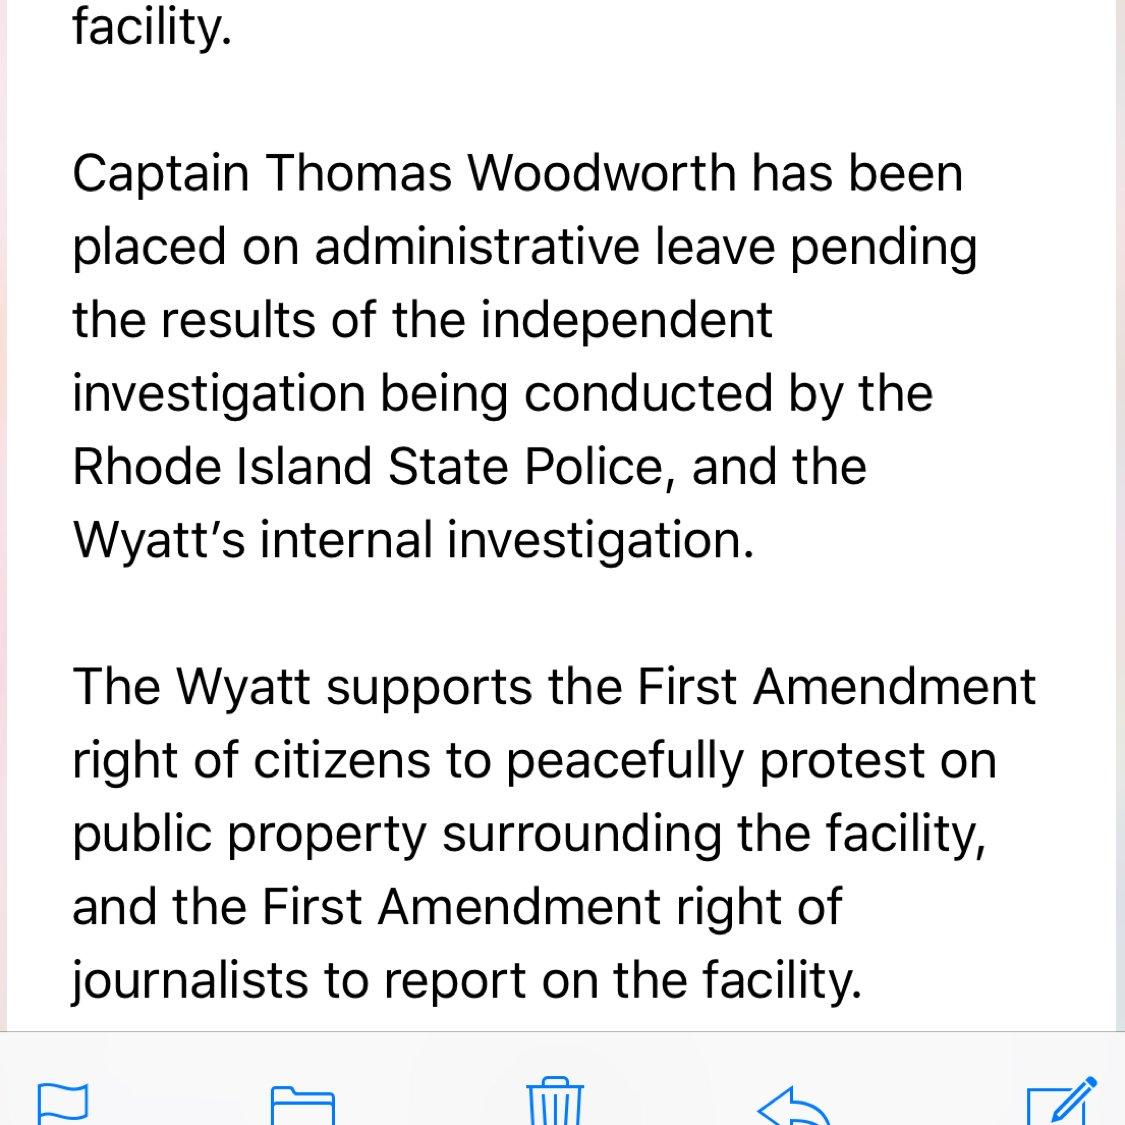 NEW: We just got a statement from the Wyatt Detention Center regarding last nights incident.